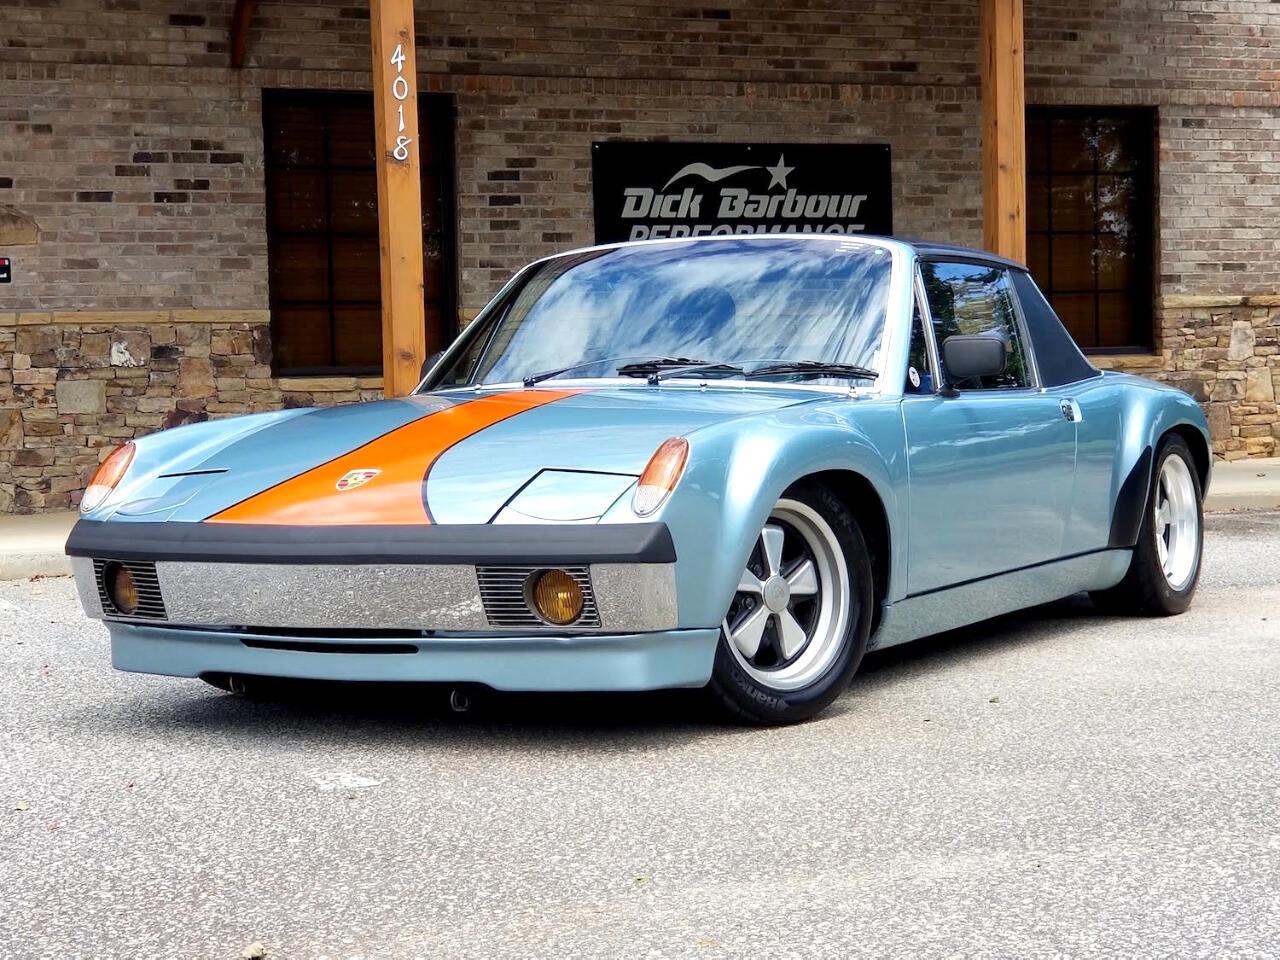 1973 Porsche 914/6 GT Tribute